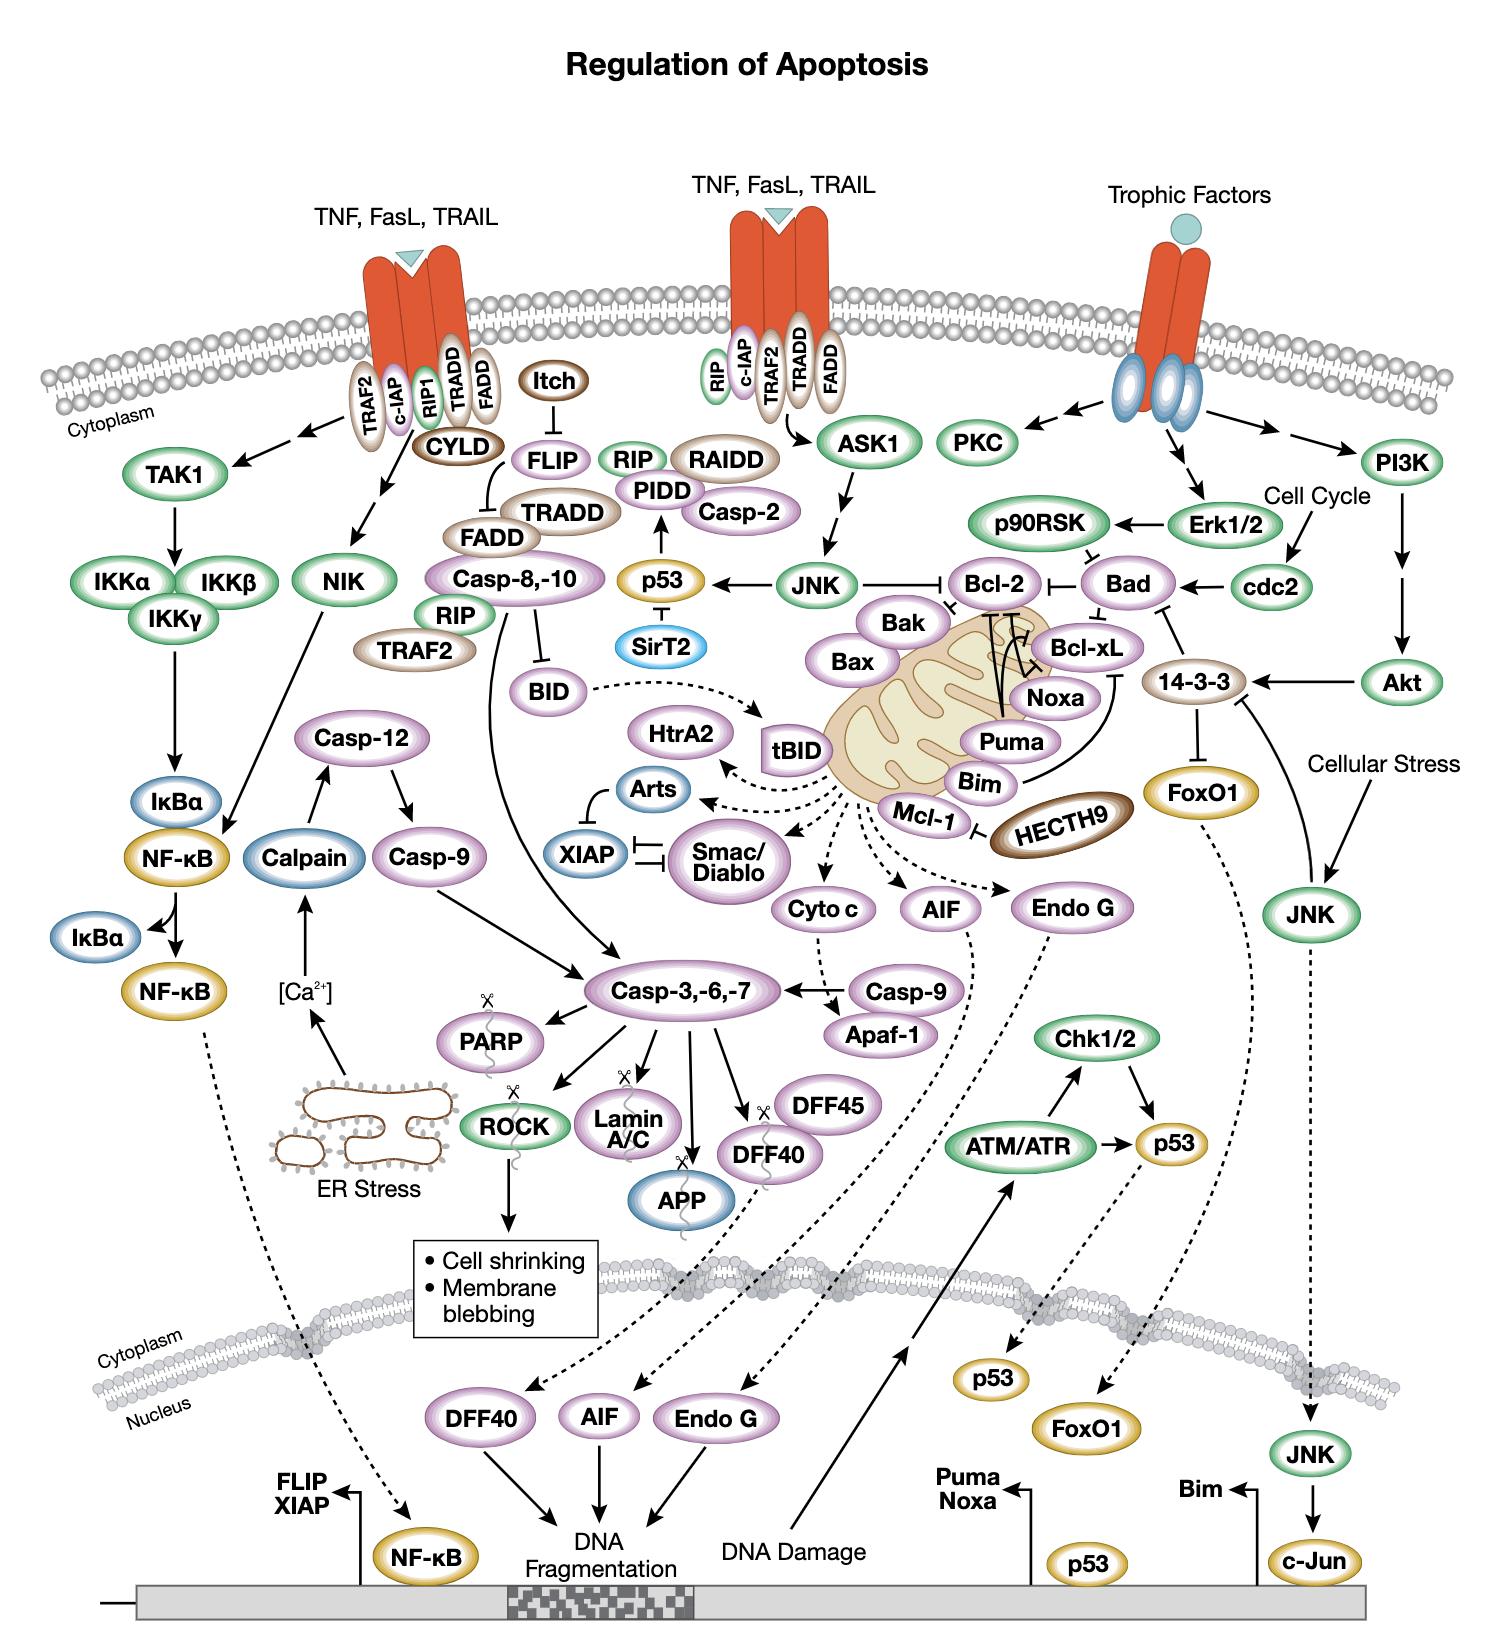 Regulation of Apoptosis Interactive Signaling Pathway